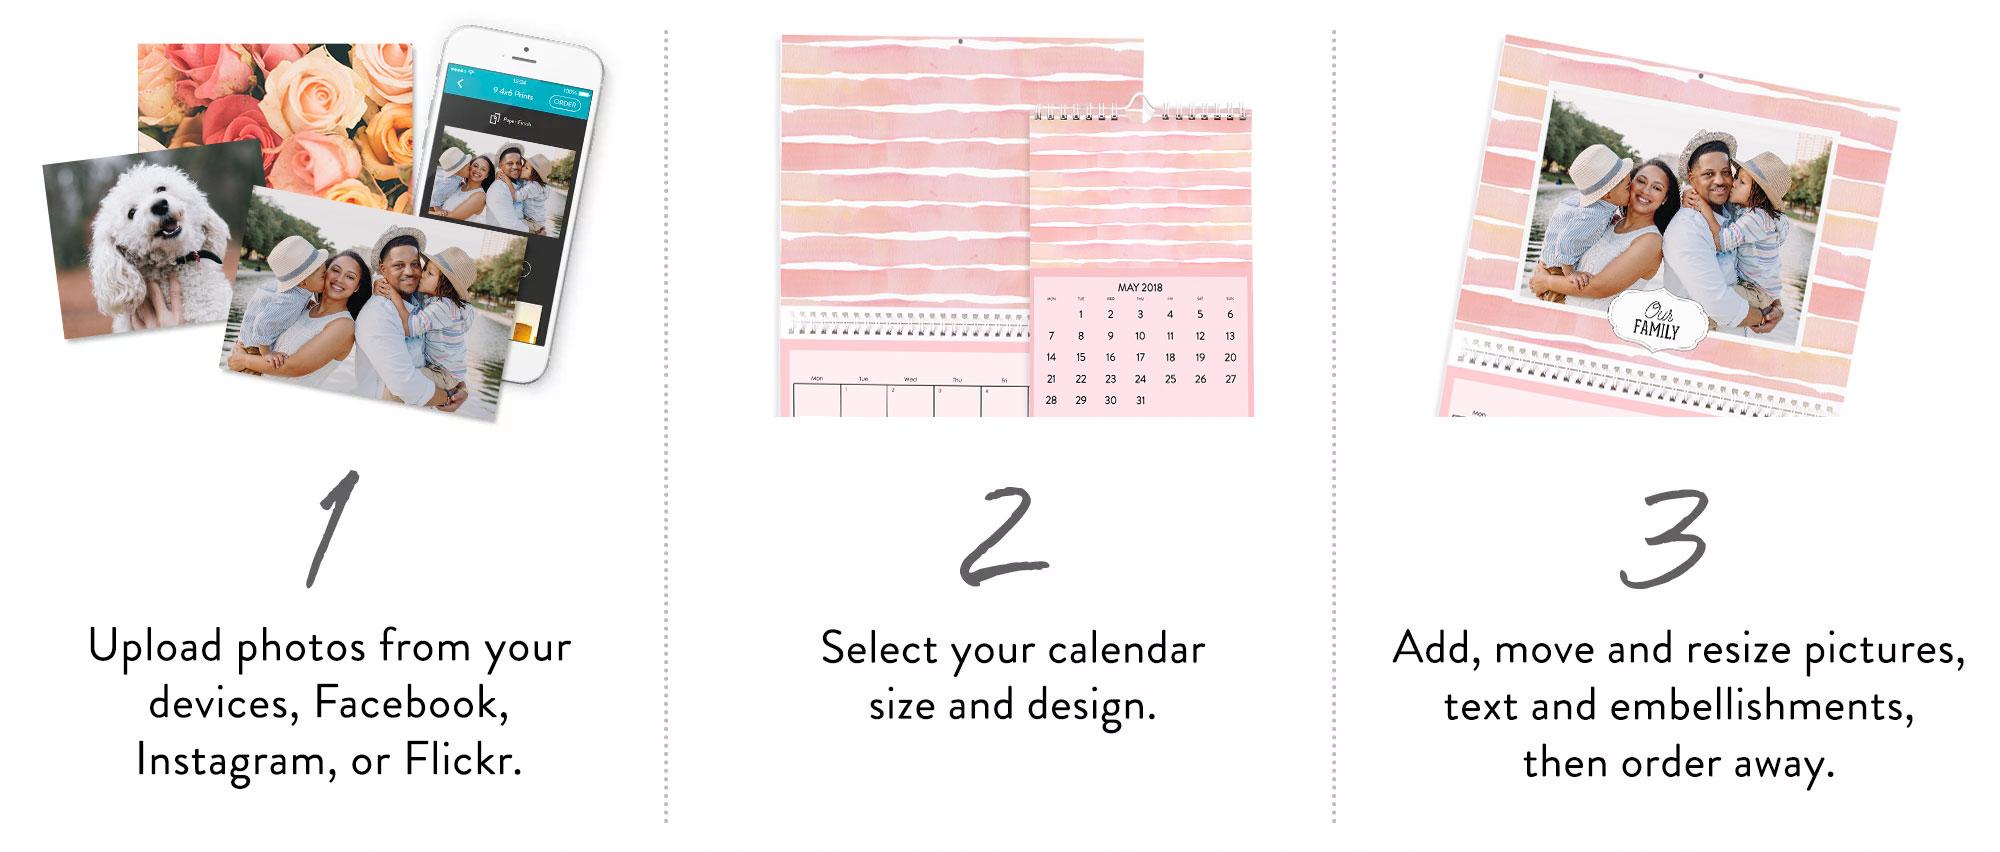 Making a calendar in 3 easy steps